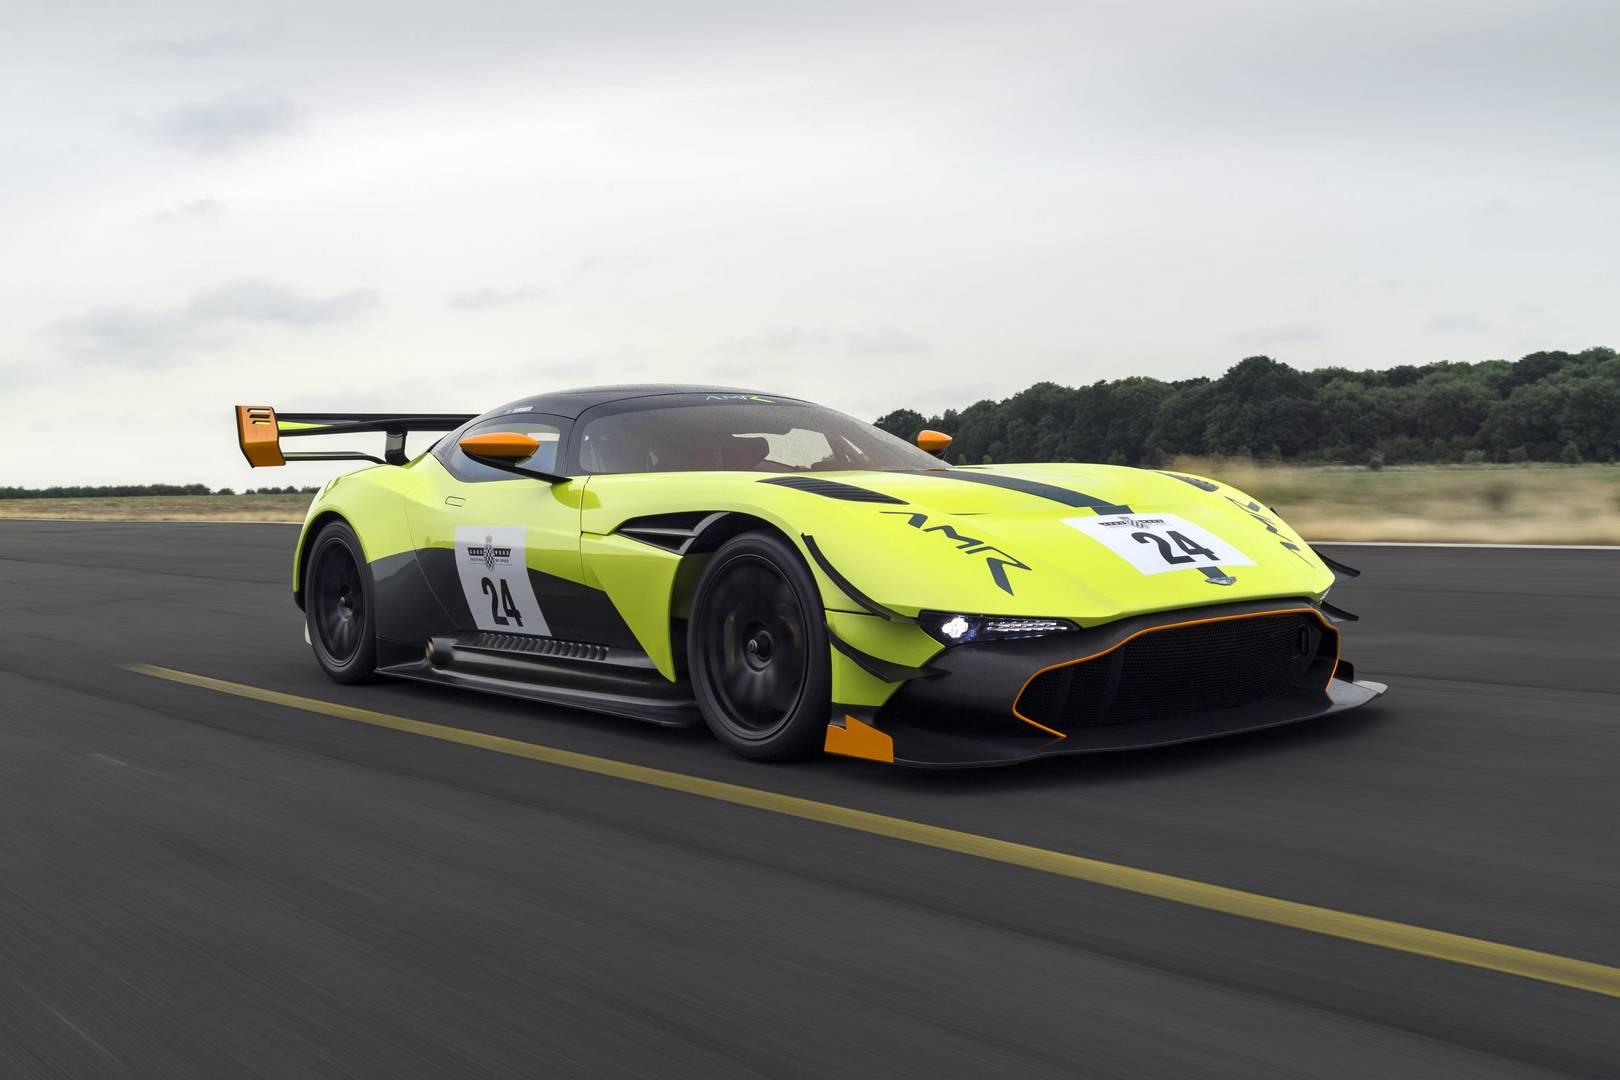 Aston Martin Vulcan gets the AMR Pro treatment